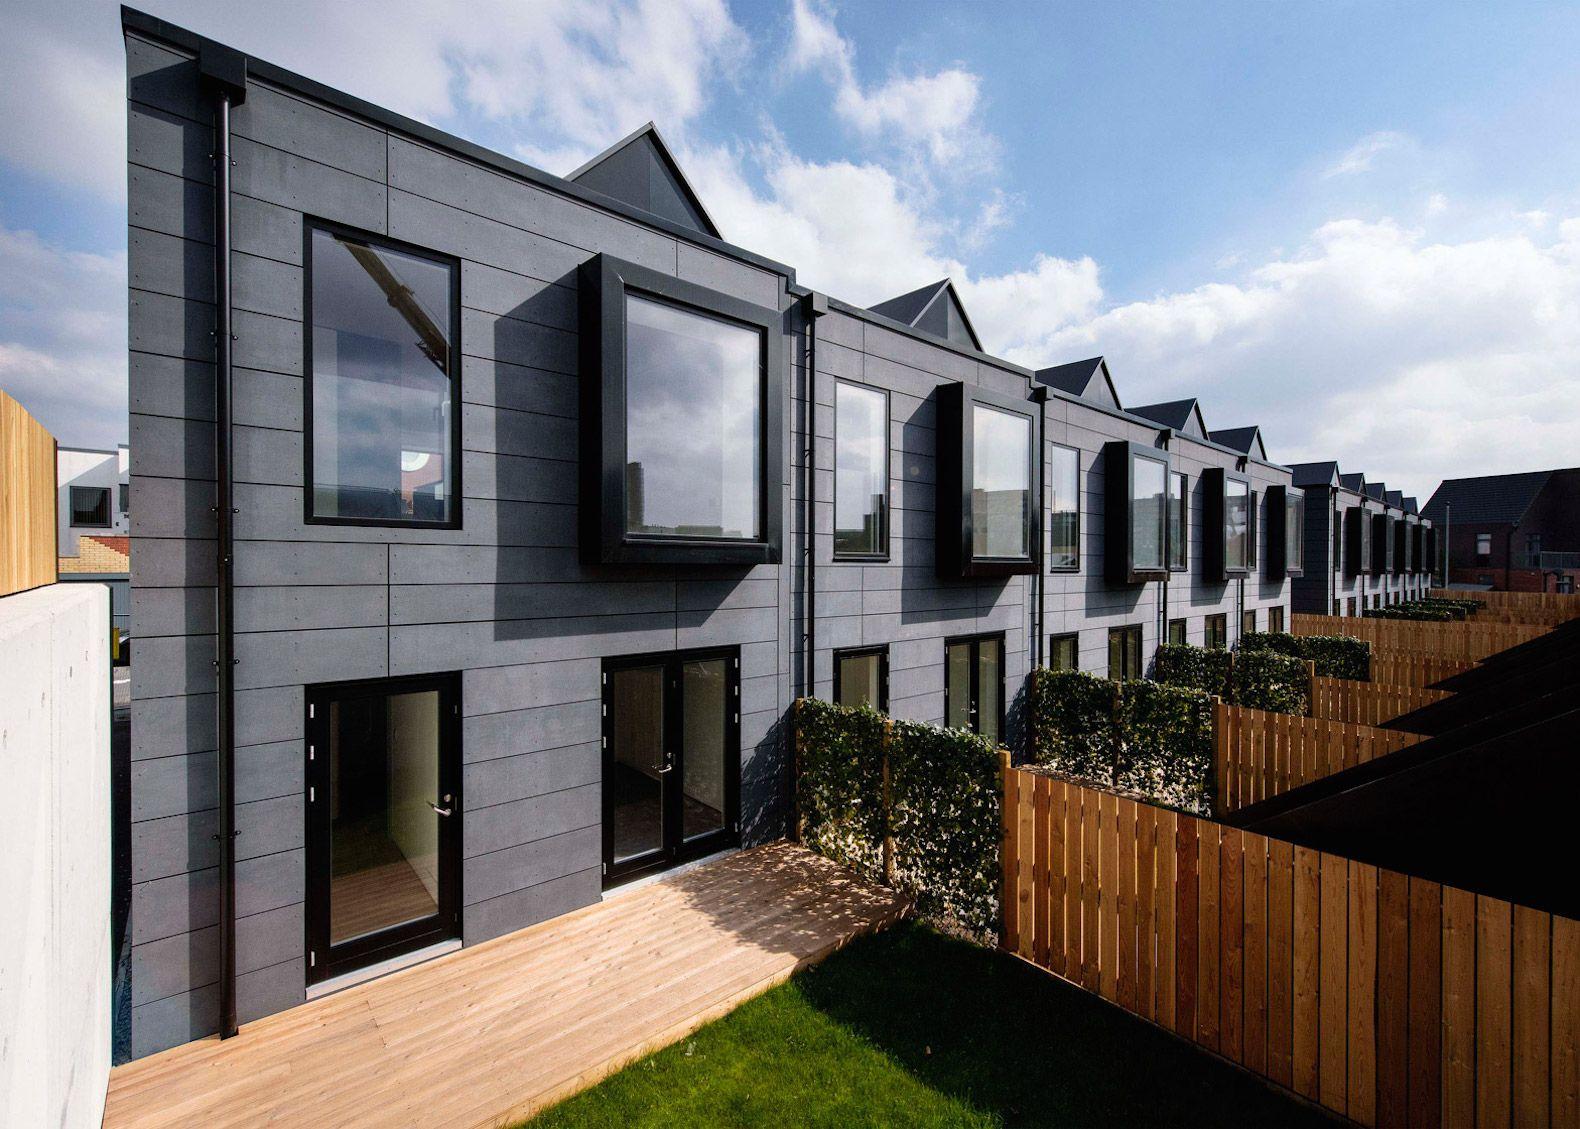 Image result for modern terraced housing | Urban housing ...